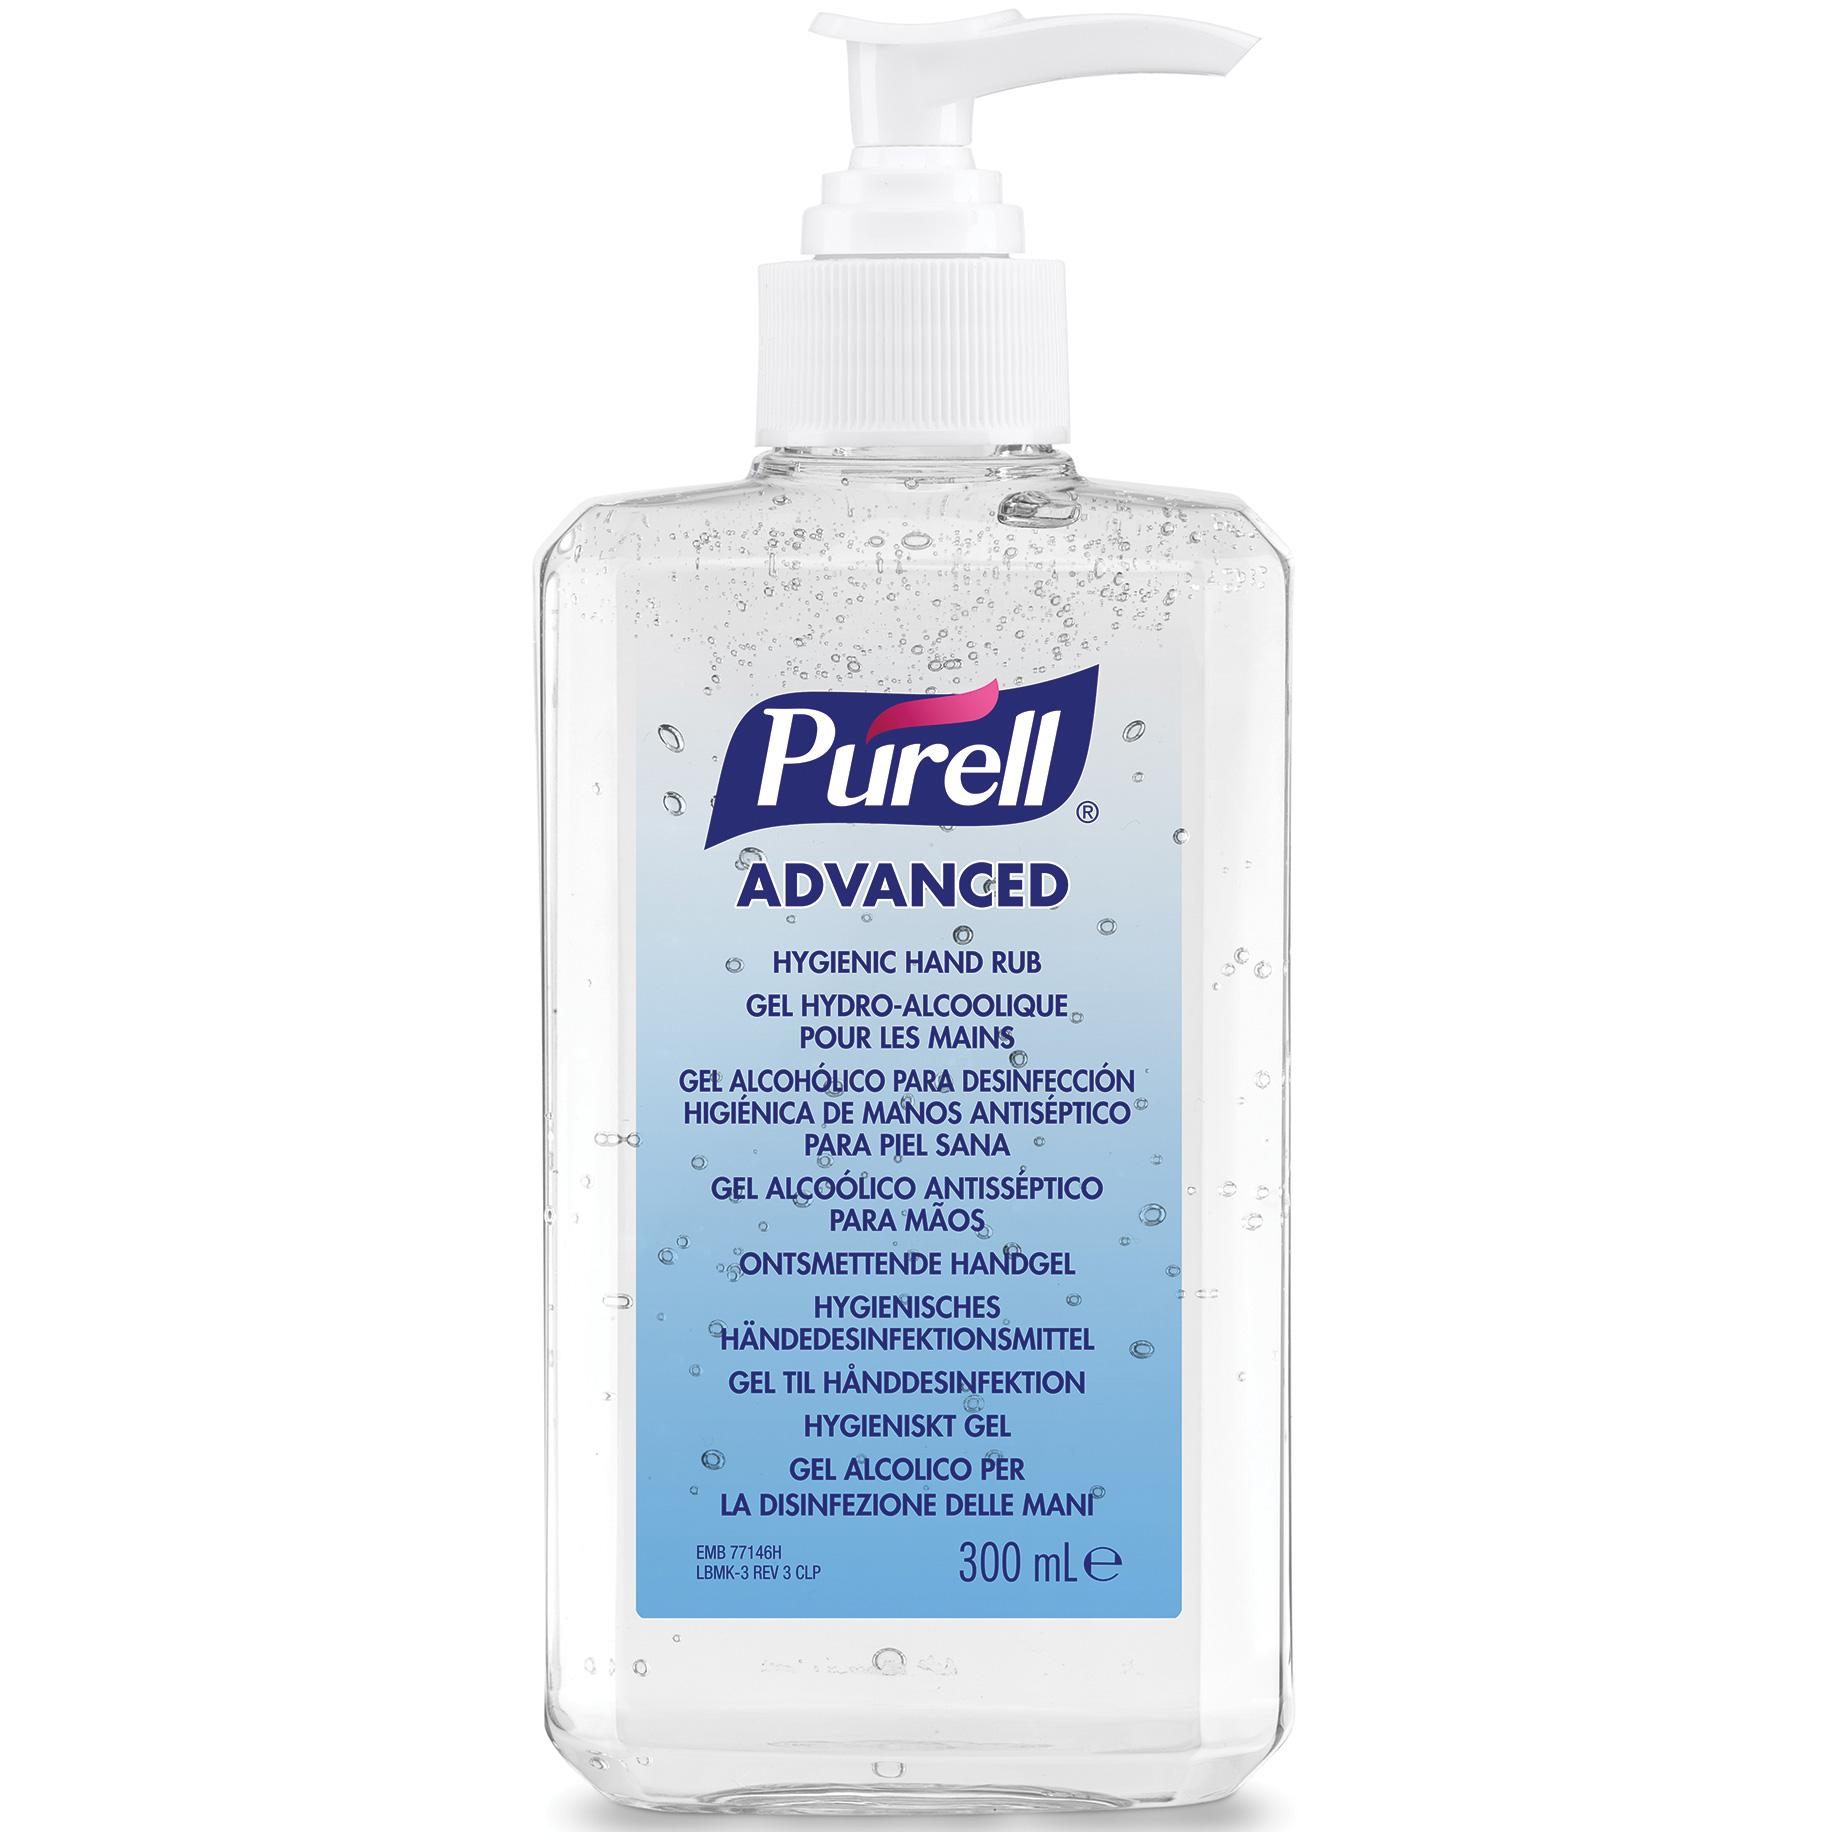 Purell Hand Rub Pump Bottle 300ml